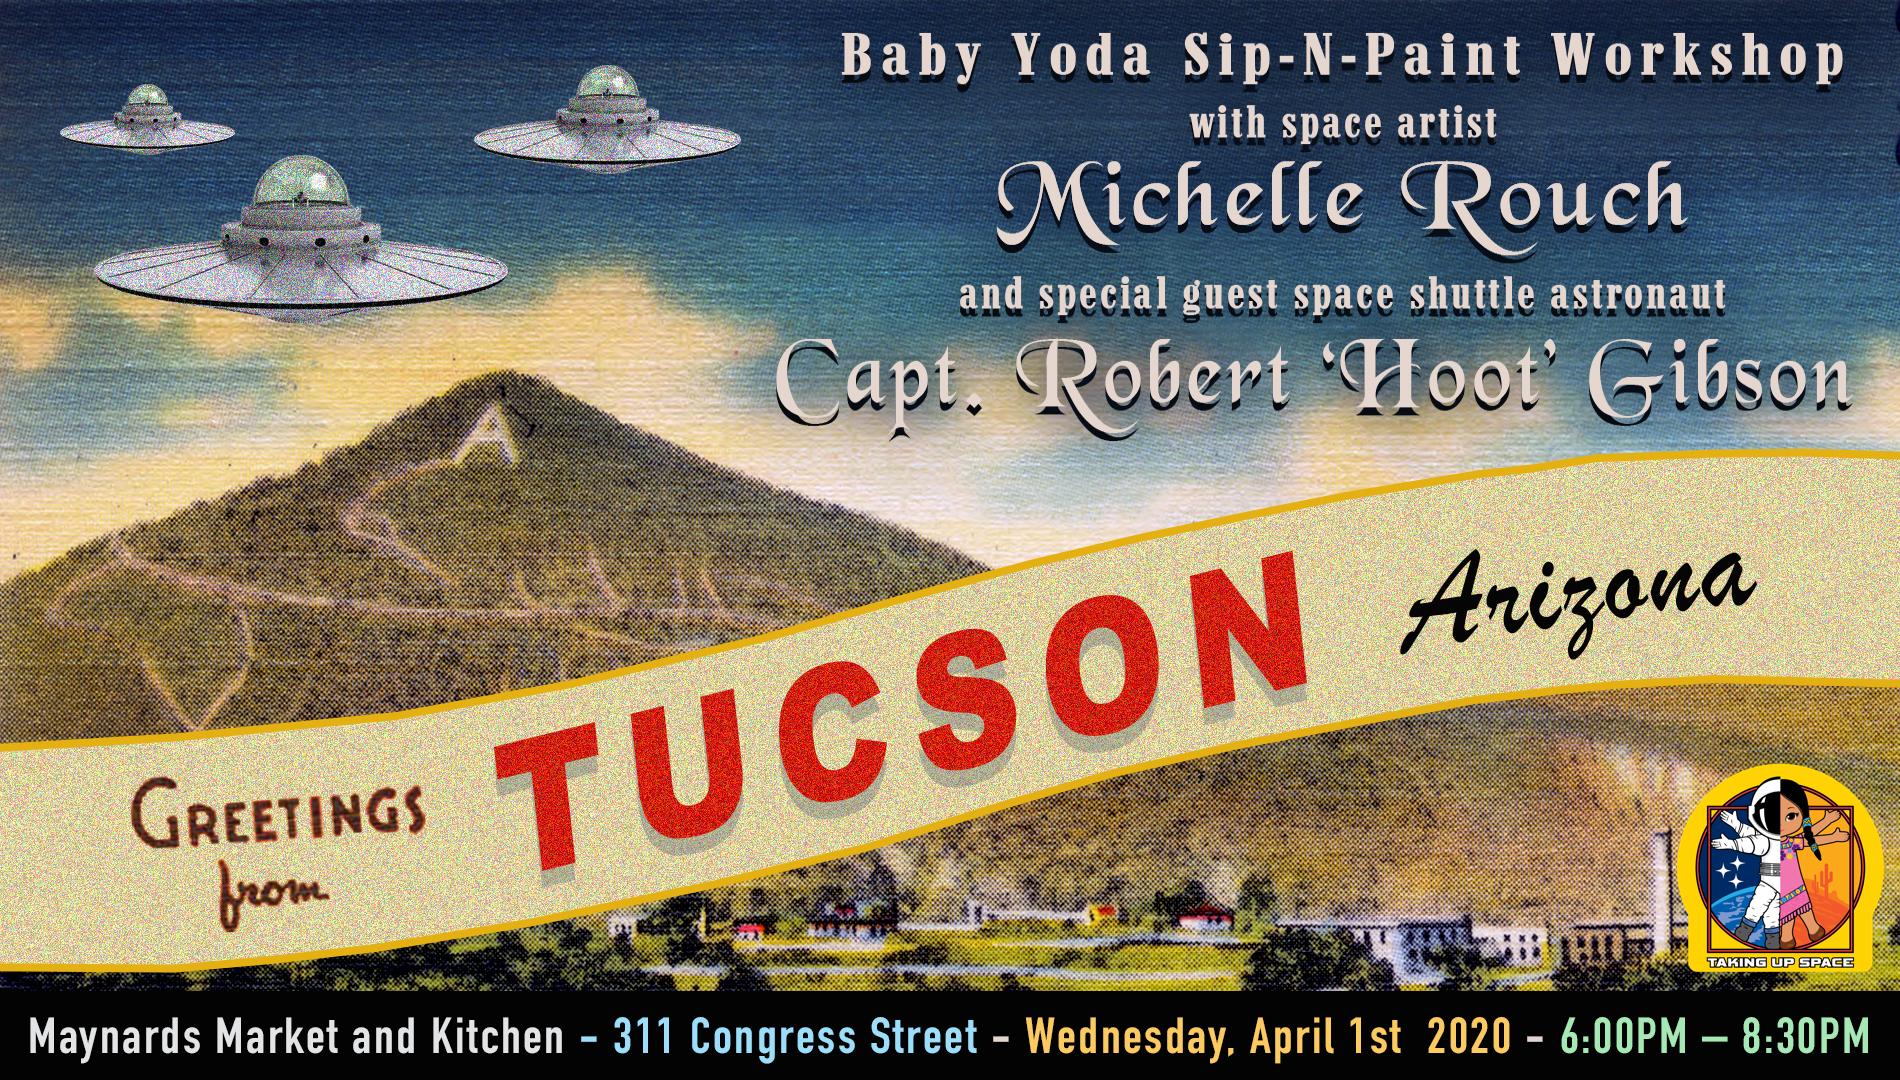 Baby Yoda Paint-N-Sip Fundraiser with an Astronaut!